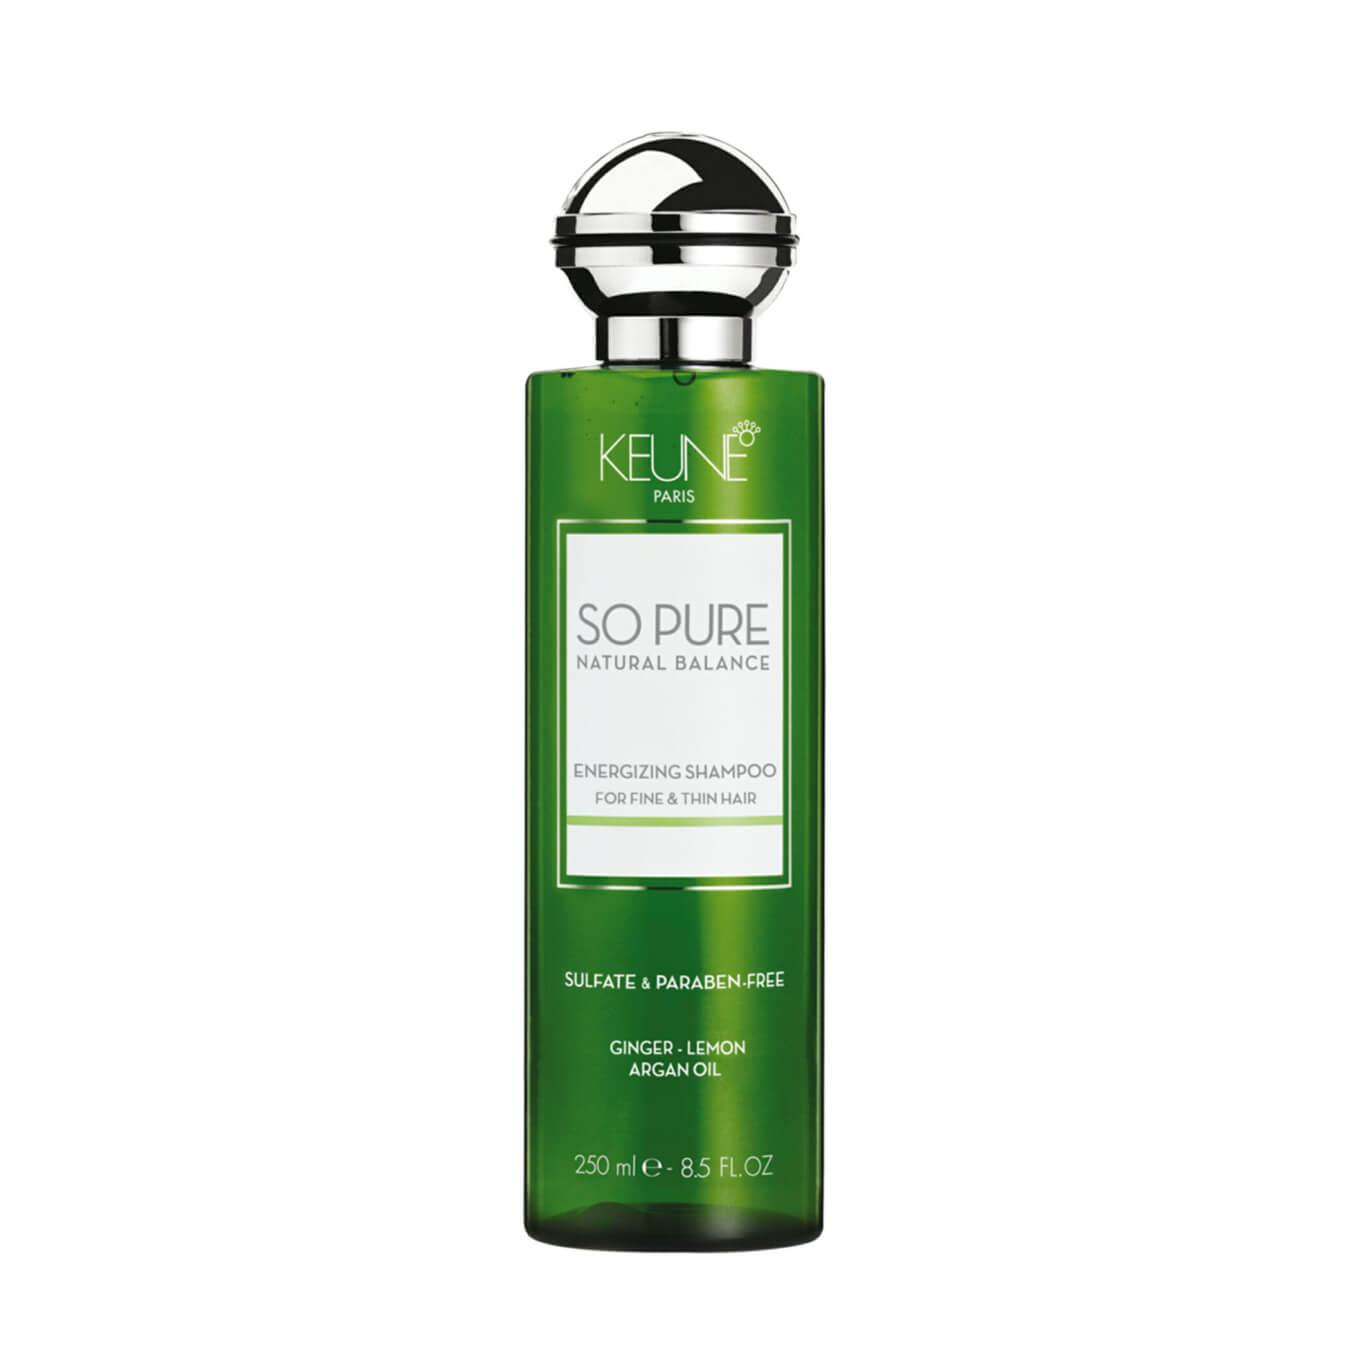 Koop Keune So Pure Energizing Shampoo 250ml